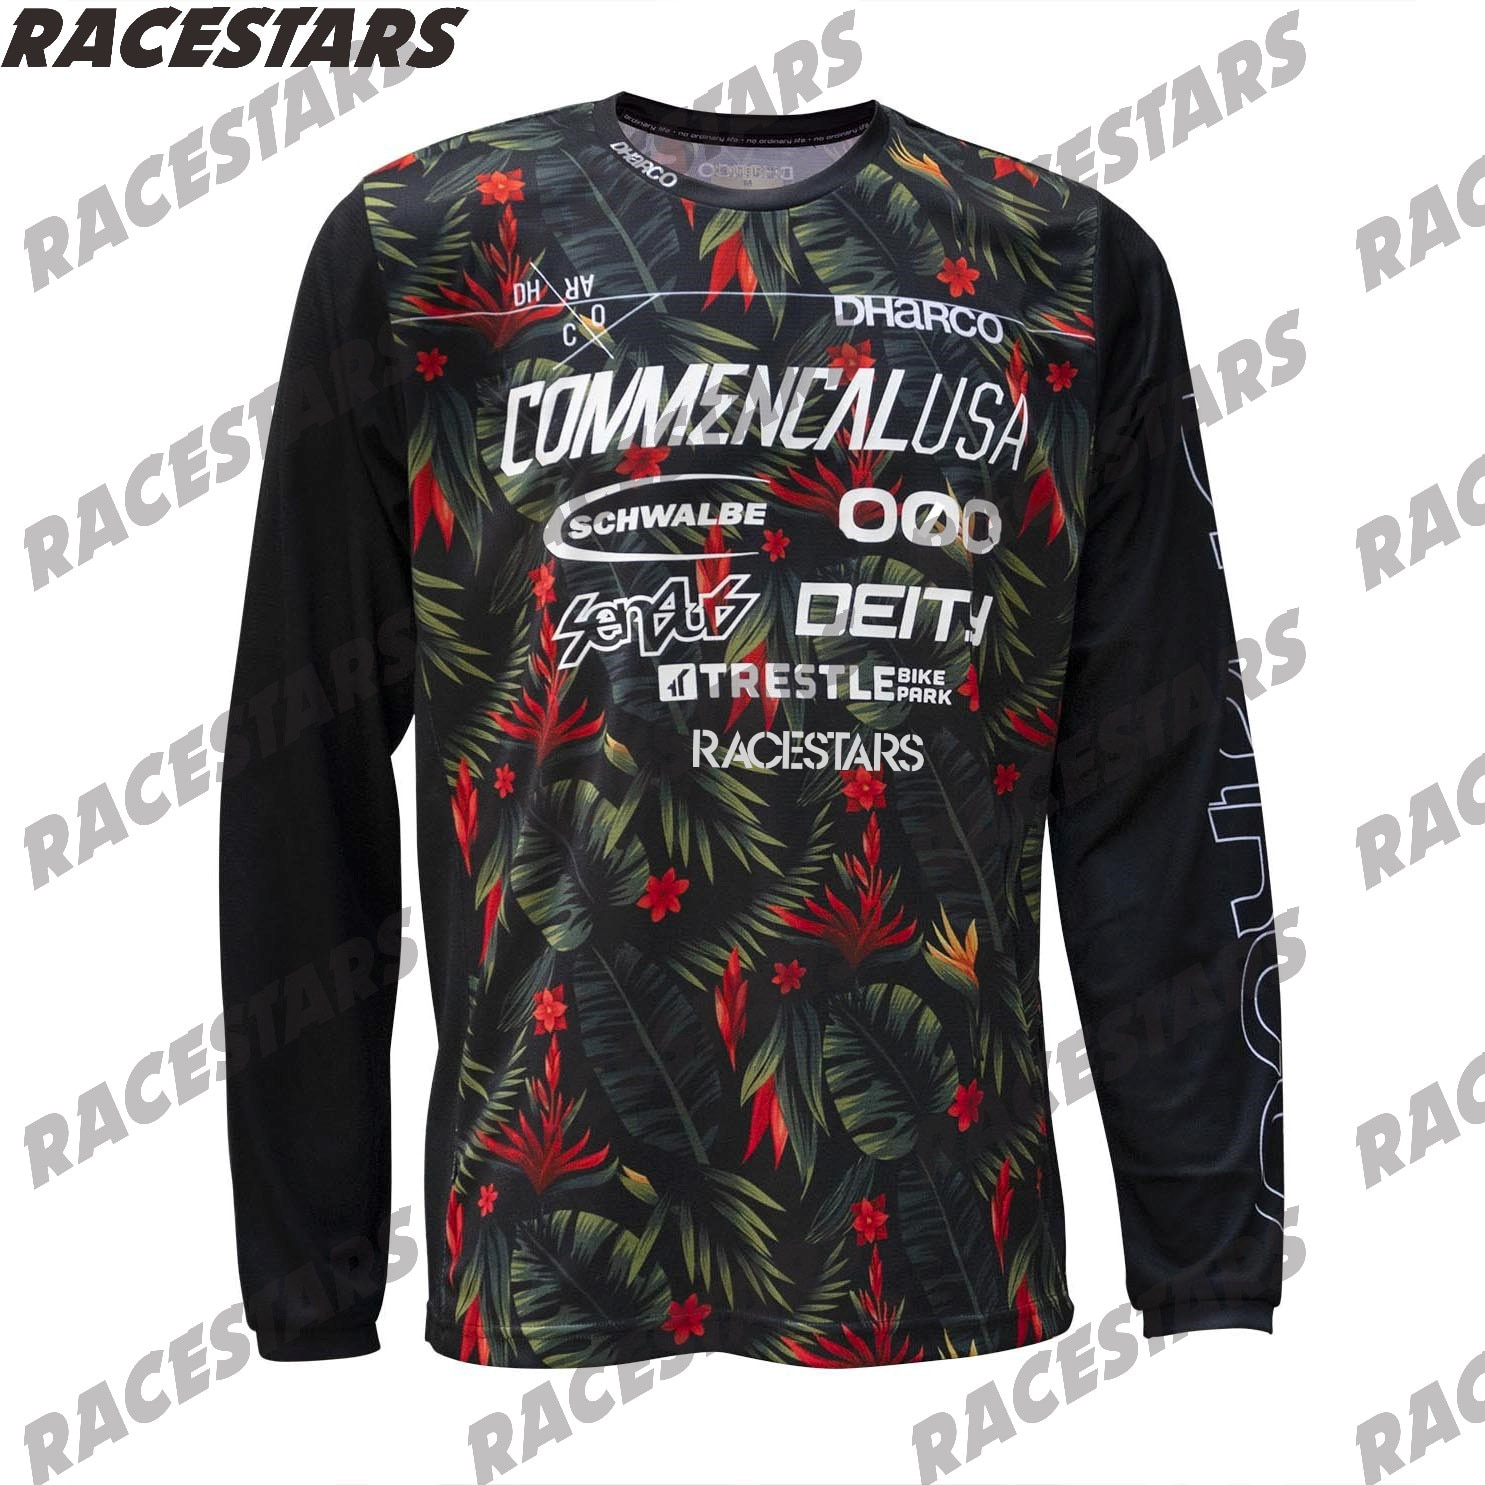 Camiseta de Ciclismo Enduro para Hombre, camisetas de carrera, Motocross, BMX, DH,...